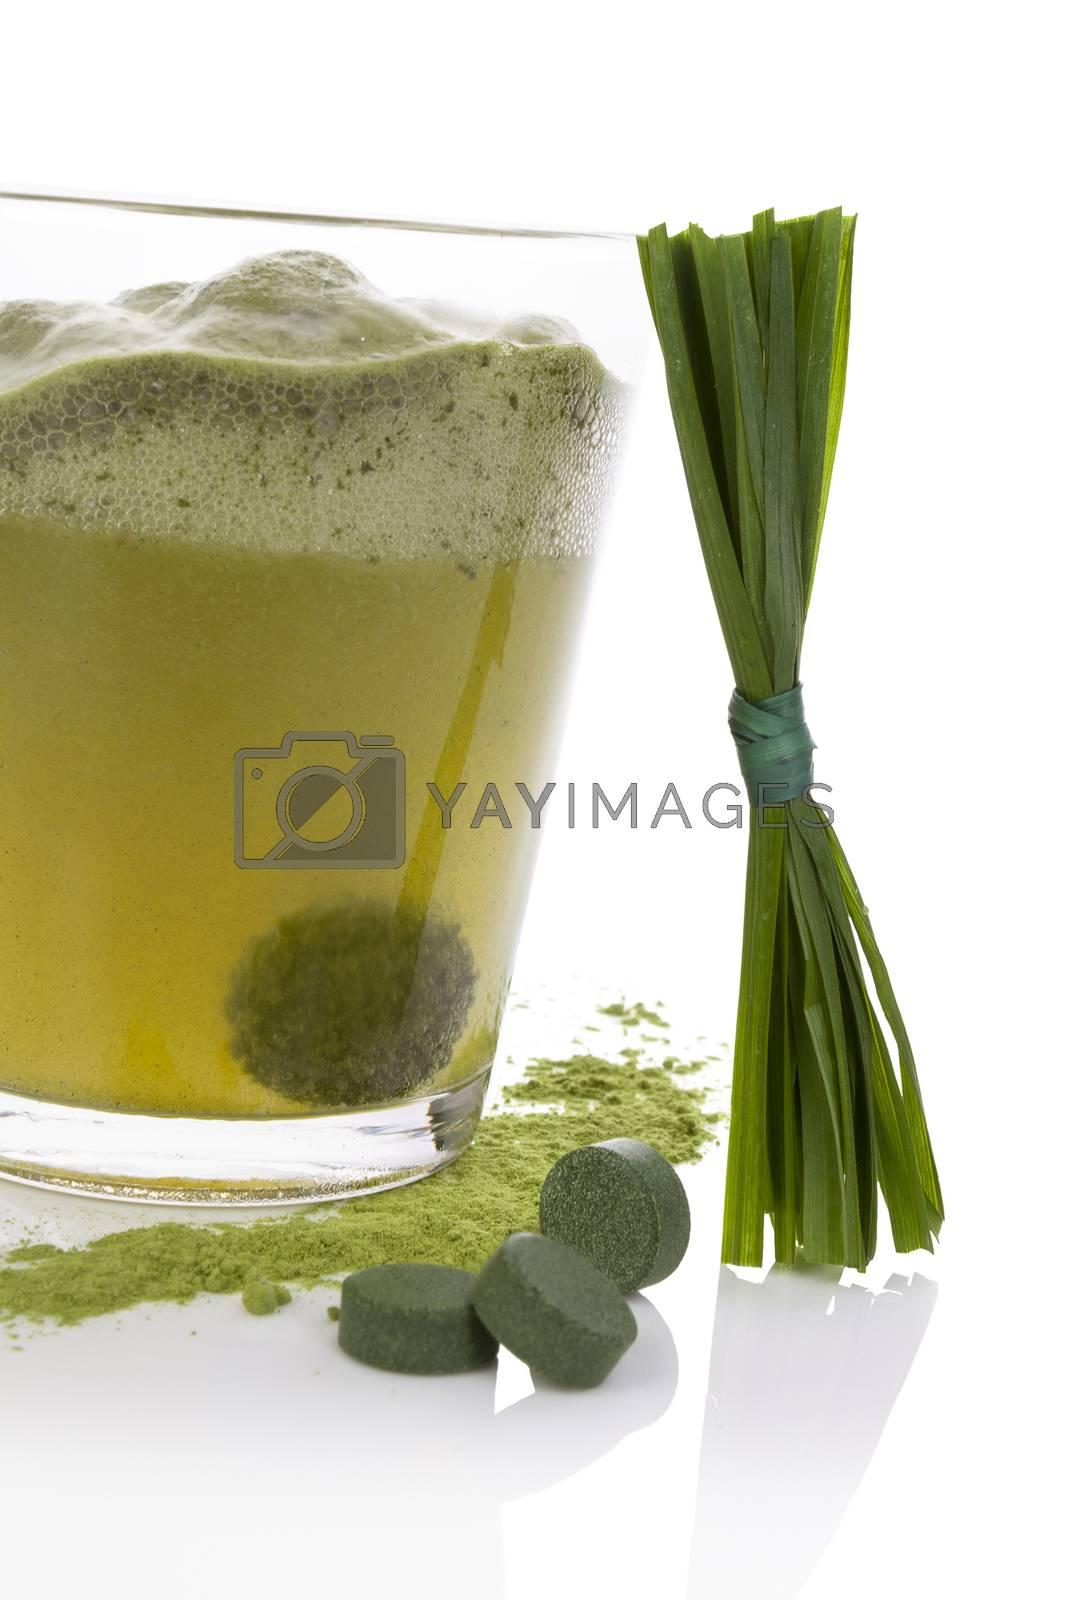 Chlorella, wheatgrass and spirulina.  by eskymaks